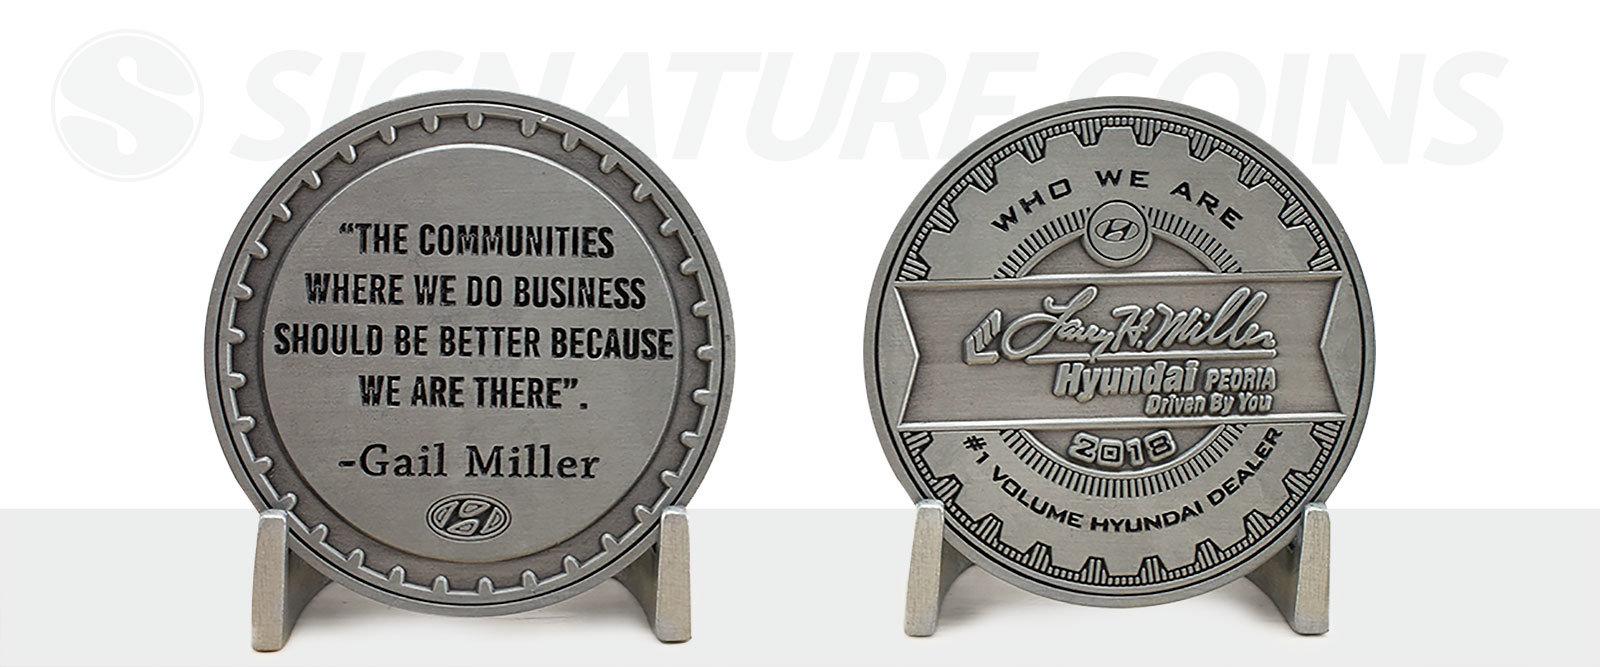 custom-coin-company-signature-coins-Hyundai-Coin